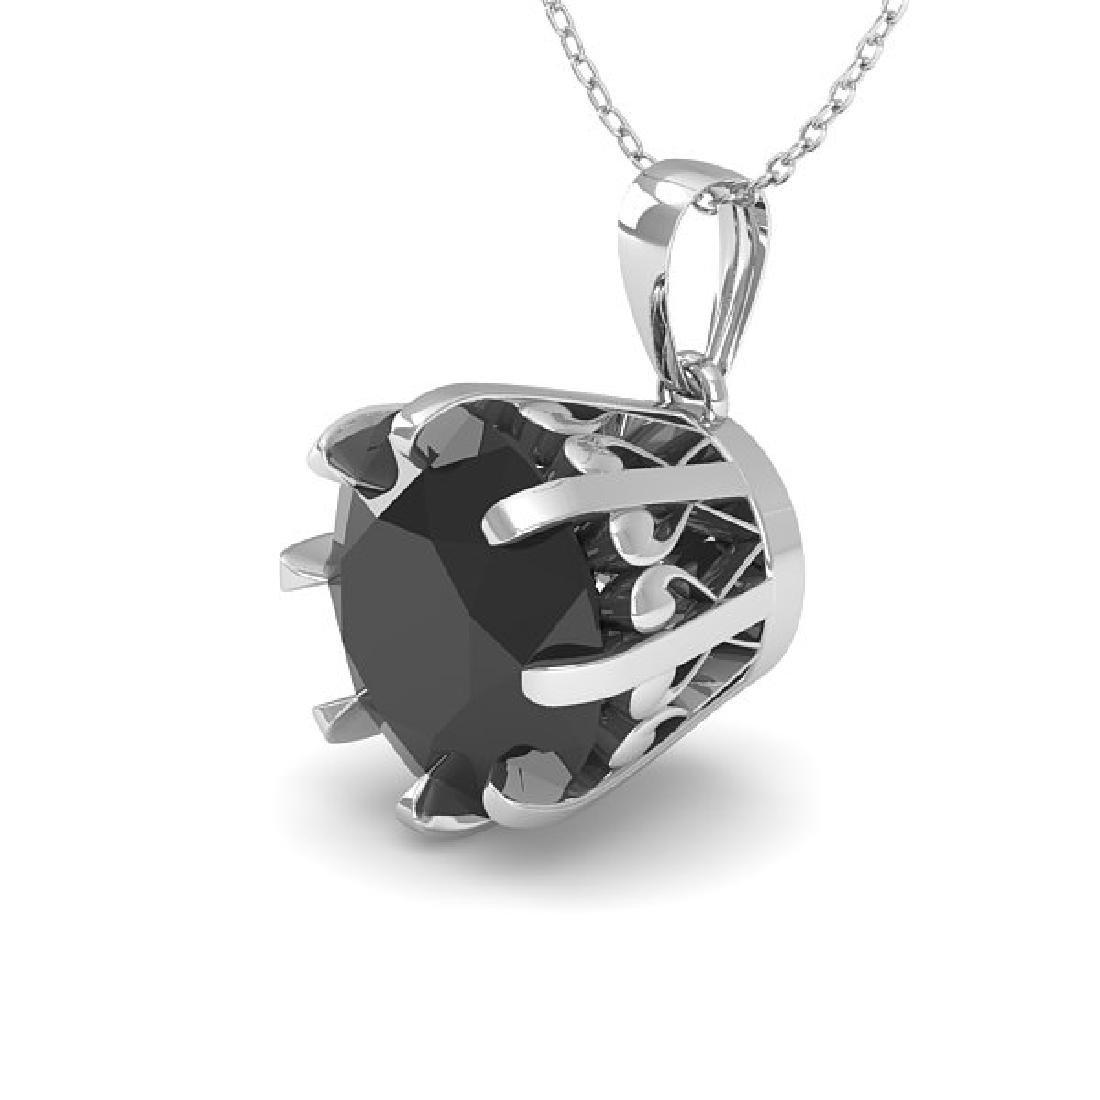 1.50 CTW Black Certified Diamond Necklace 18K White